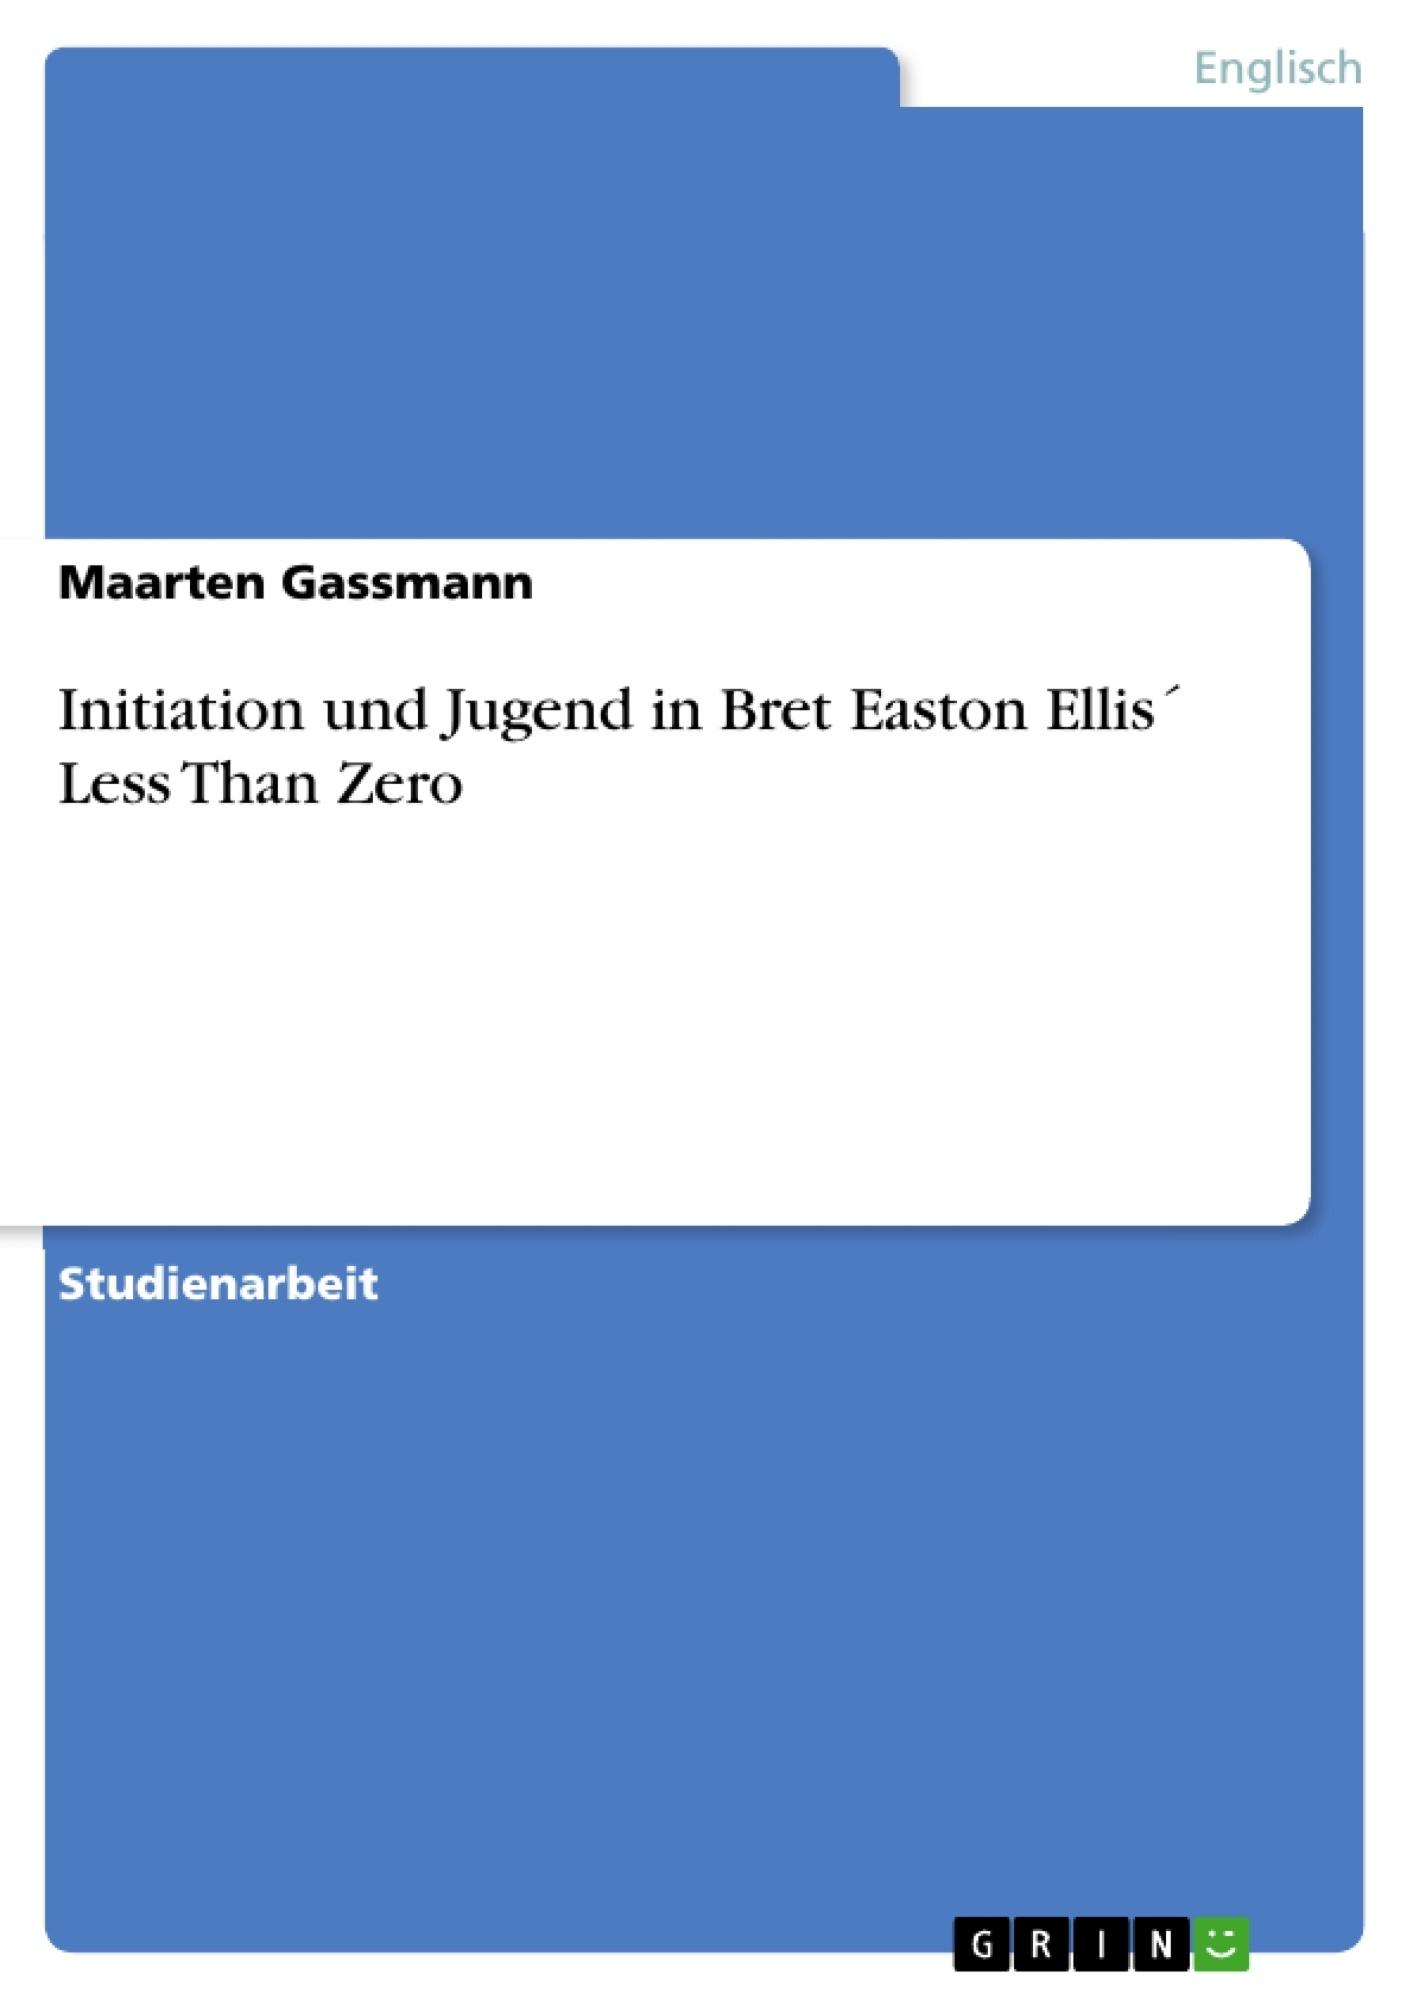 Titel: Initiation und Jugend in Bret Easton Ellis´ Less Than Zero